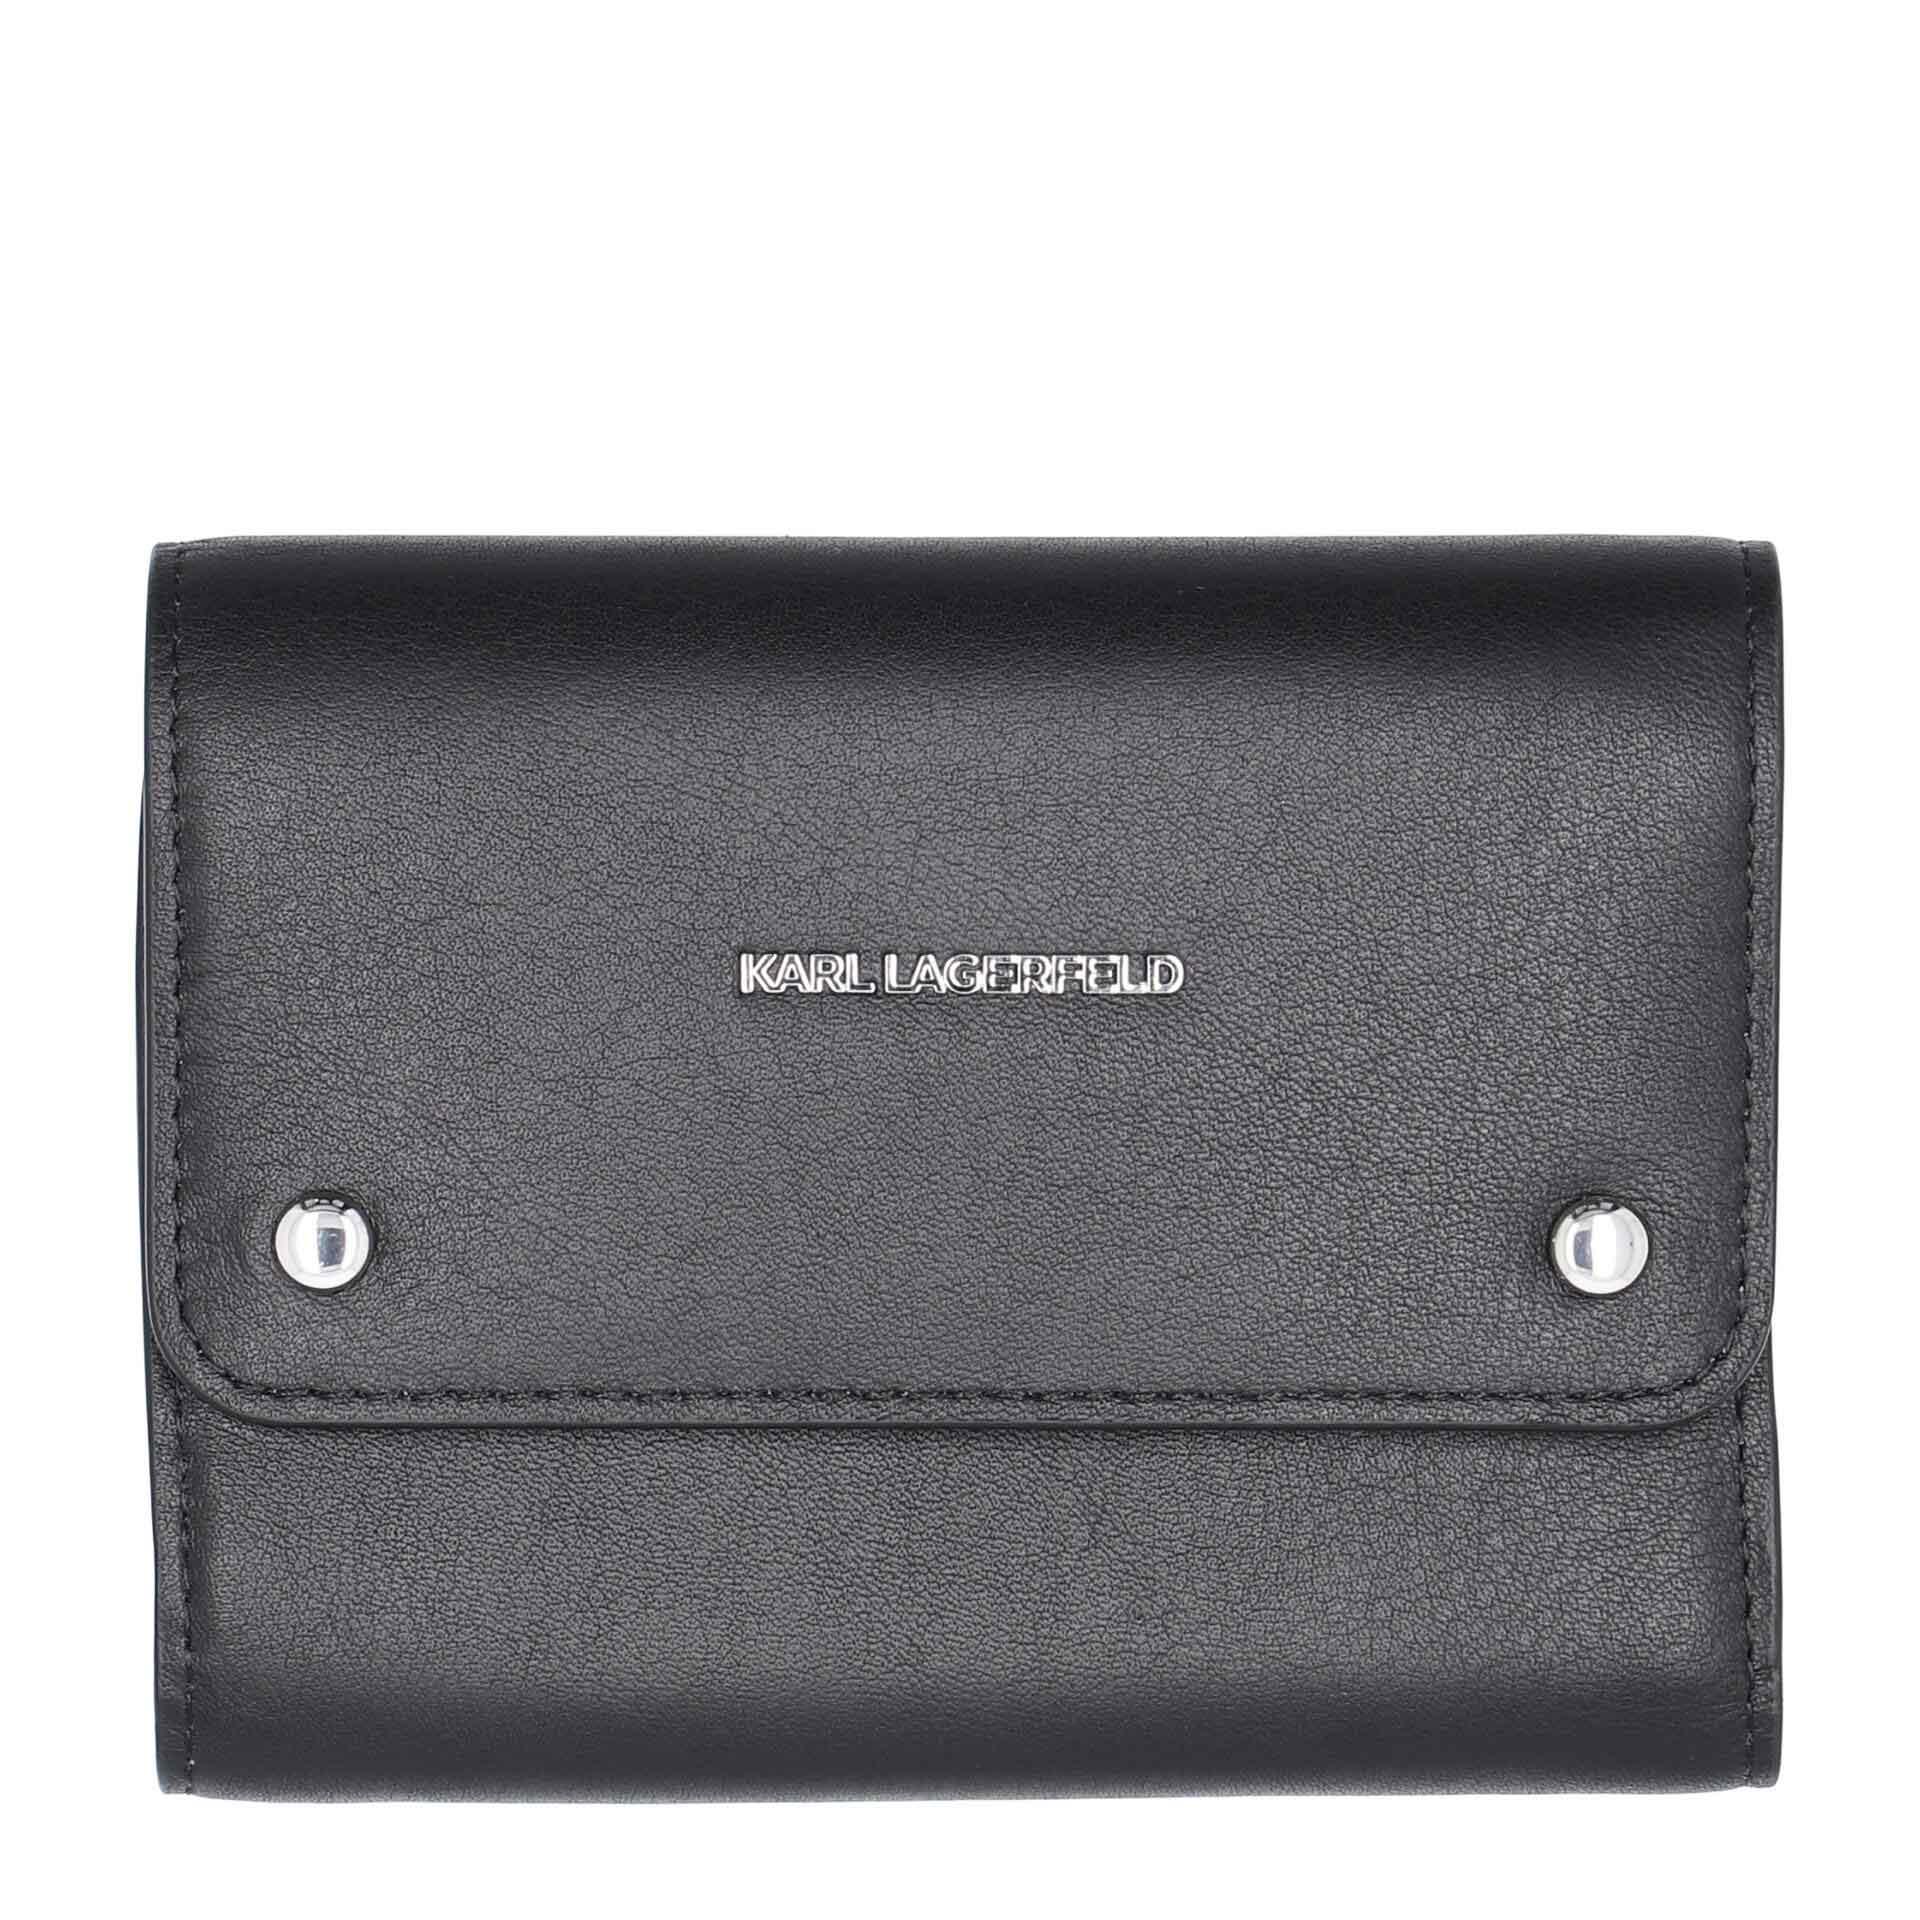 Karl Lagerfeld K/Ikon  Damengeldbörse black